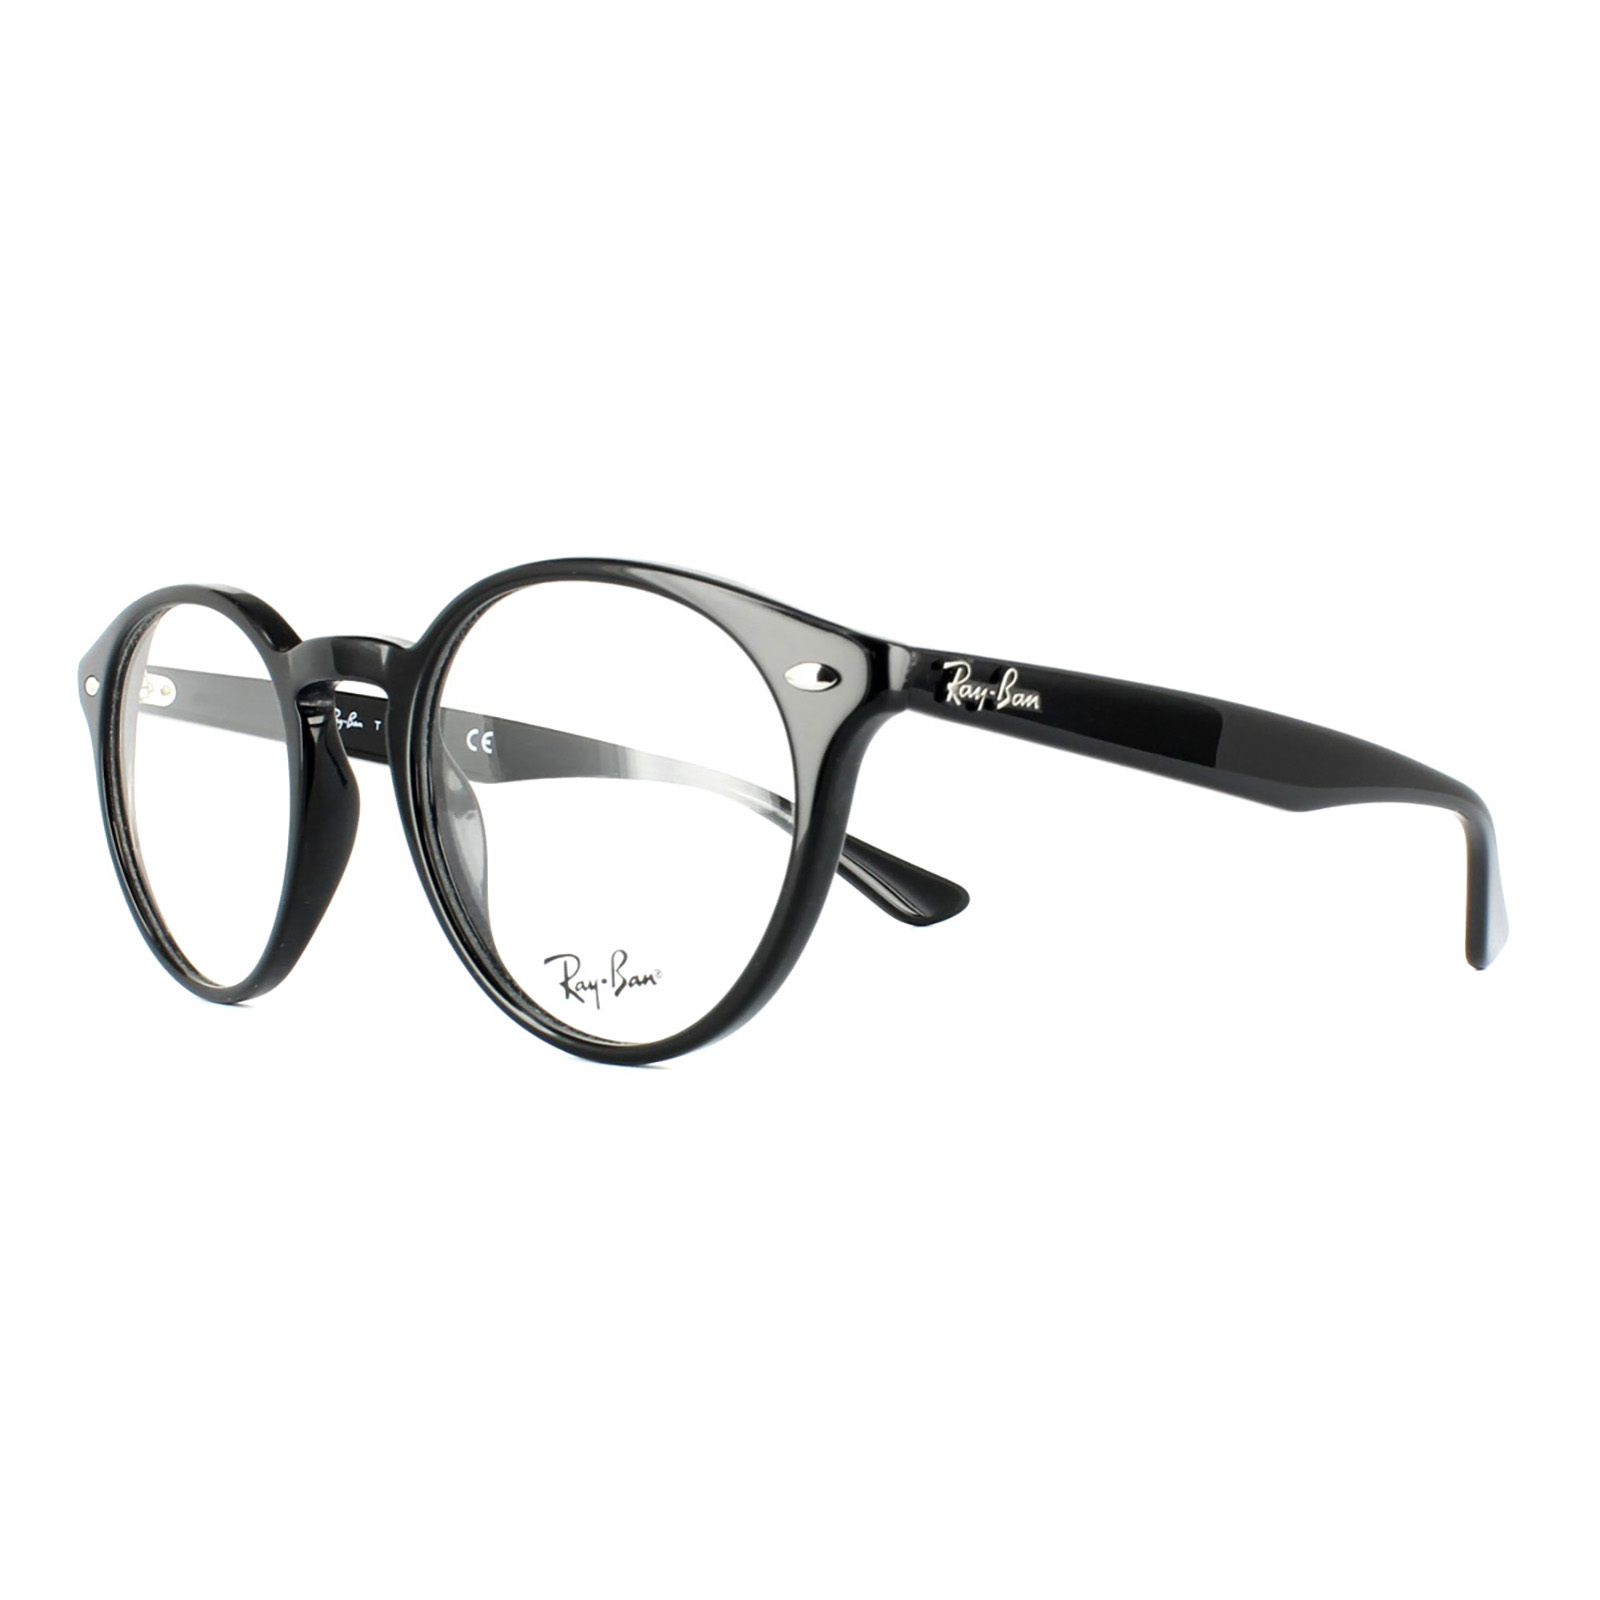 8796fb5c2e8 Details about Ray-Ban Glasses Frames 2180V 2000 Shiny Black Mens Womens 47mm